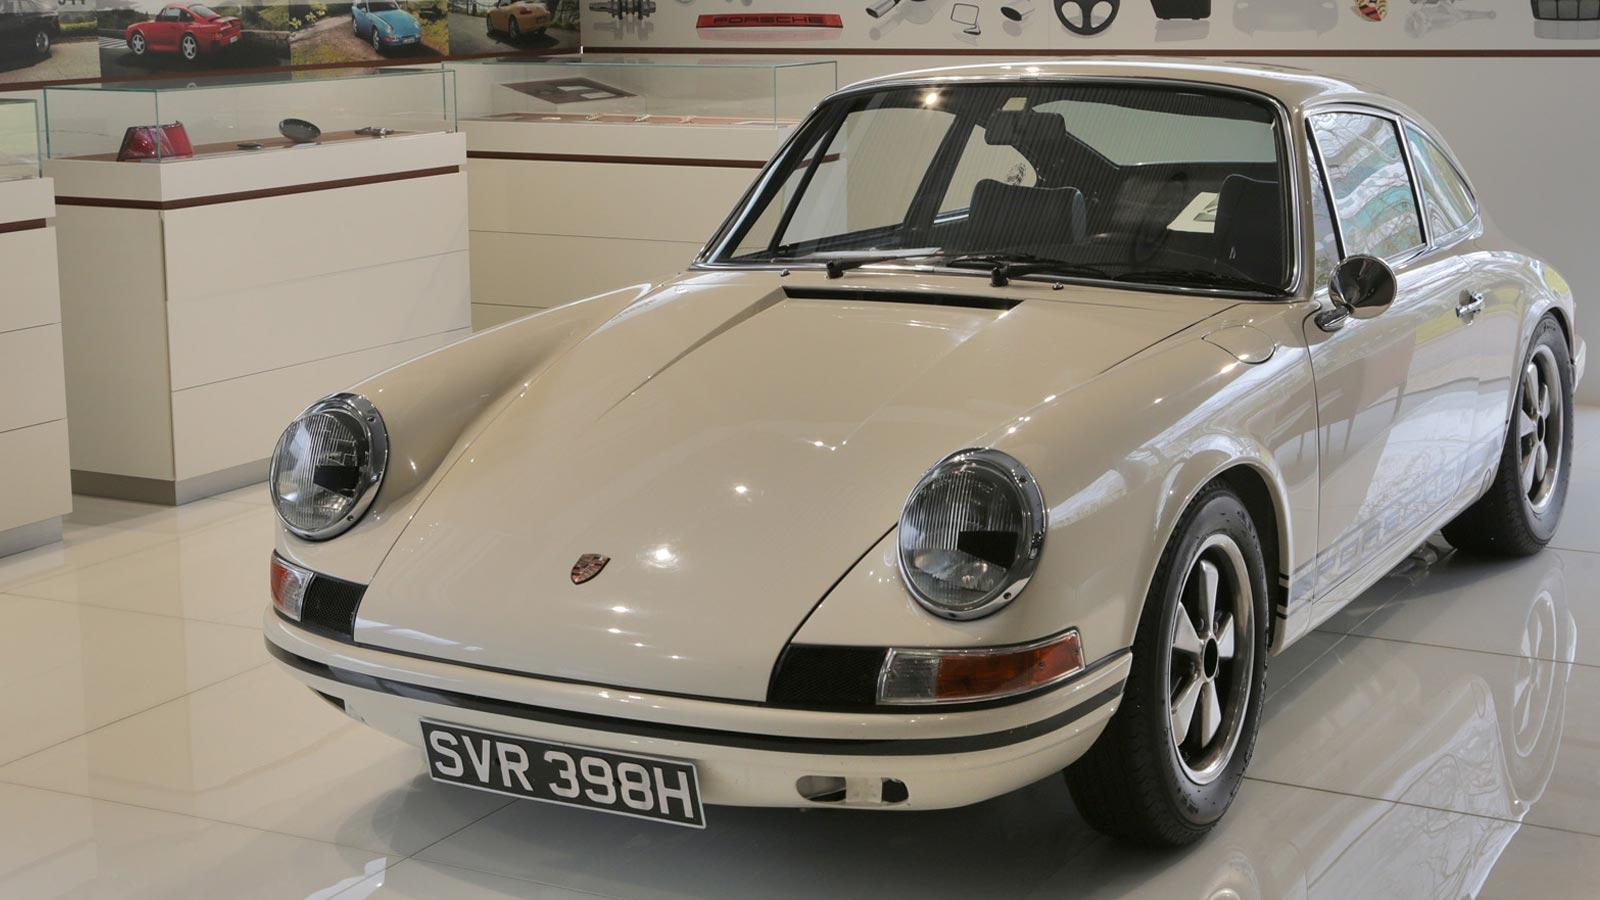 Porsche - Порше Центр Хатфилд